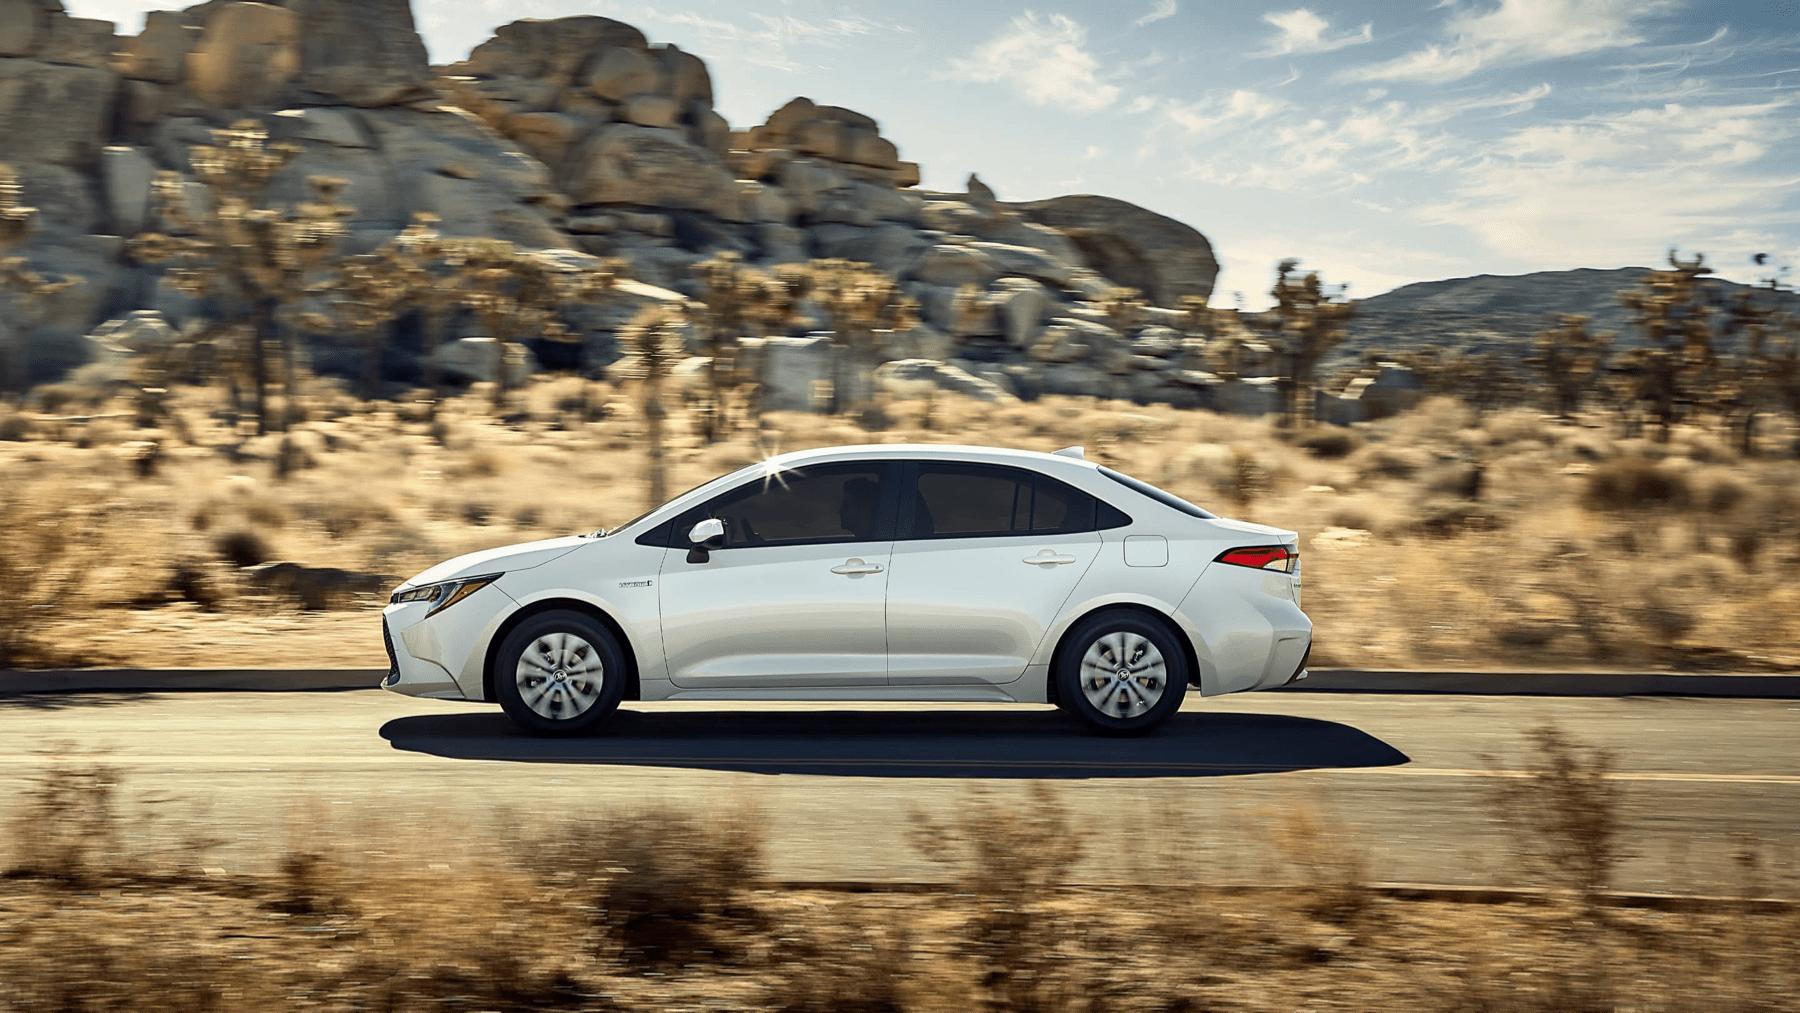 2020 Toyota Corolla on road